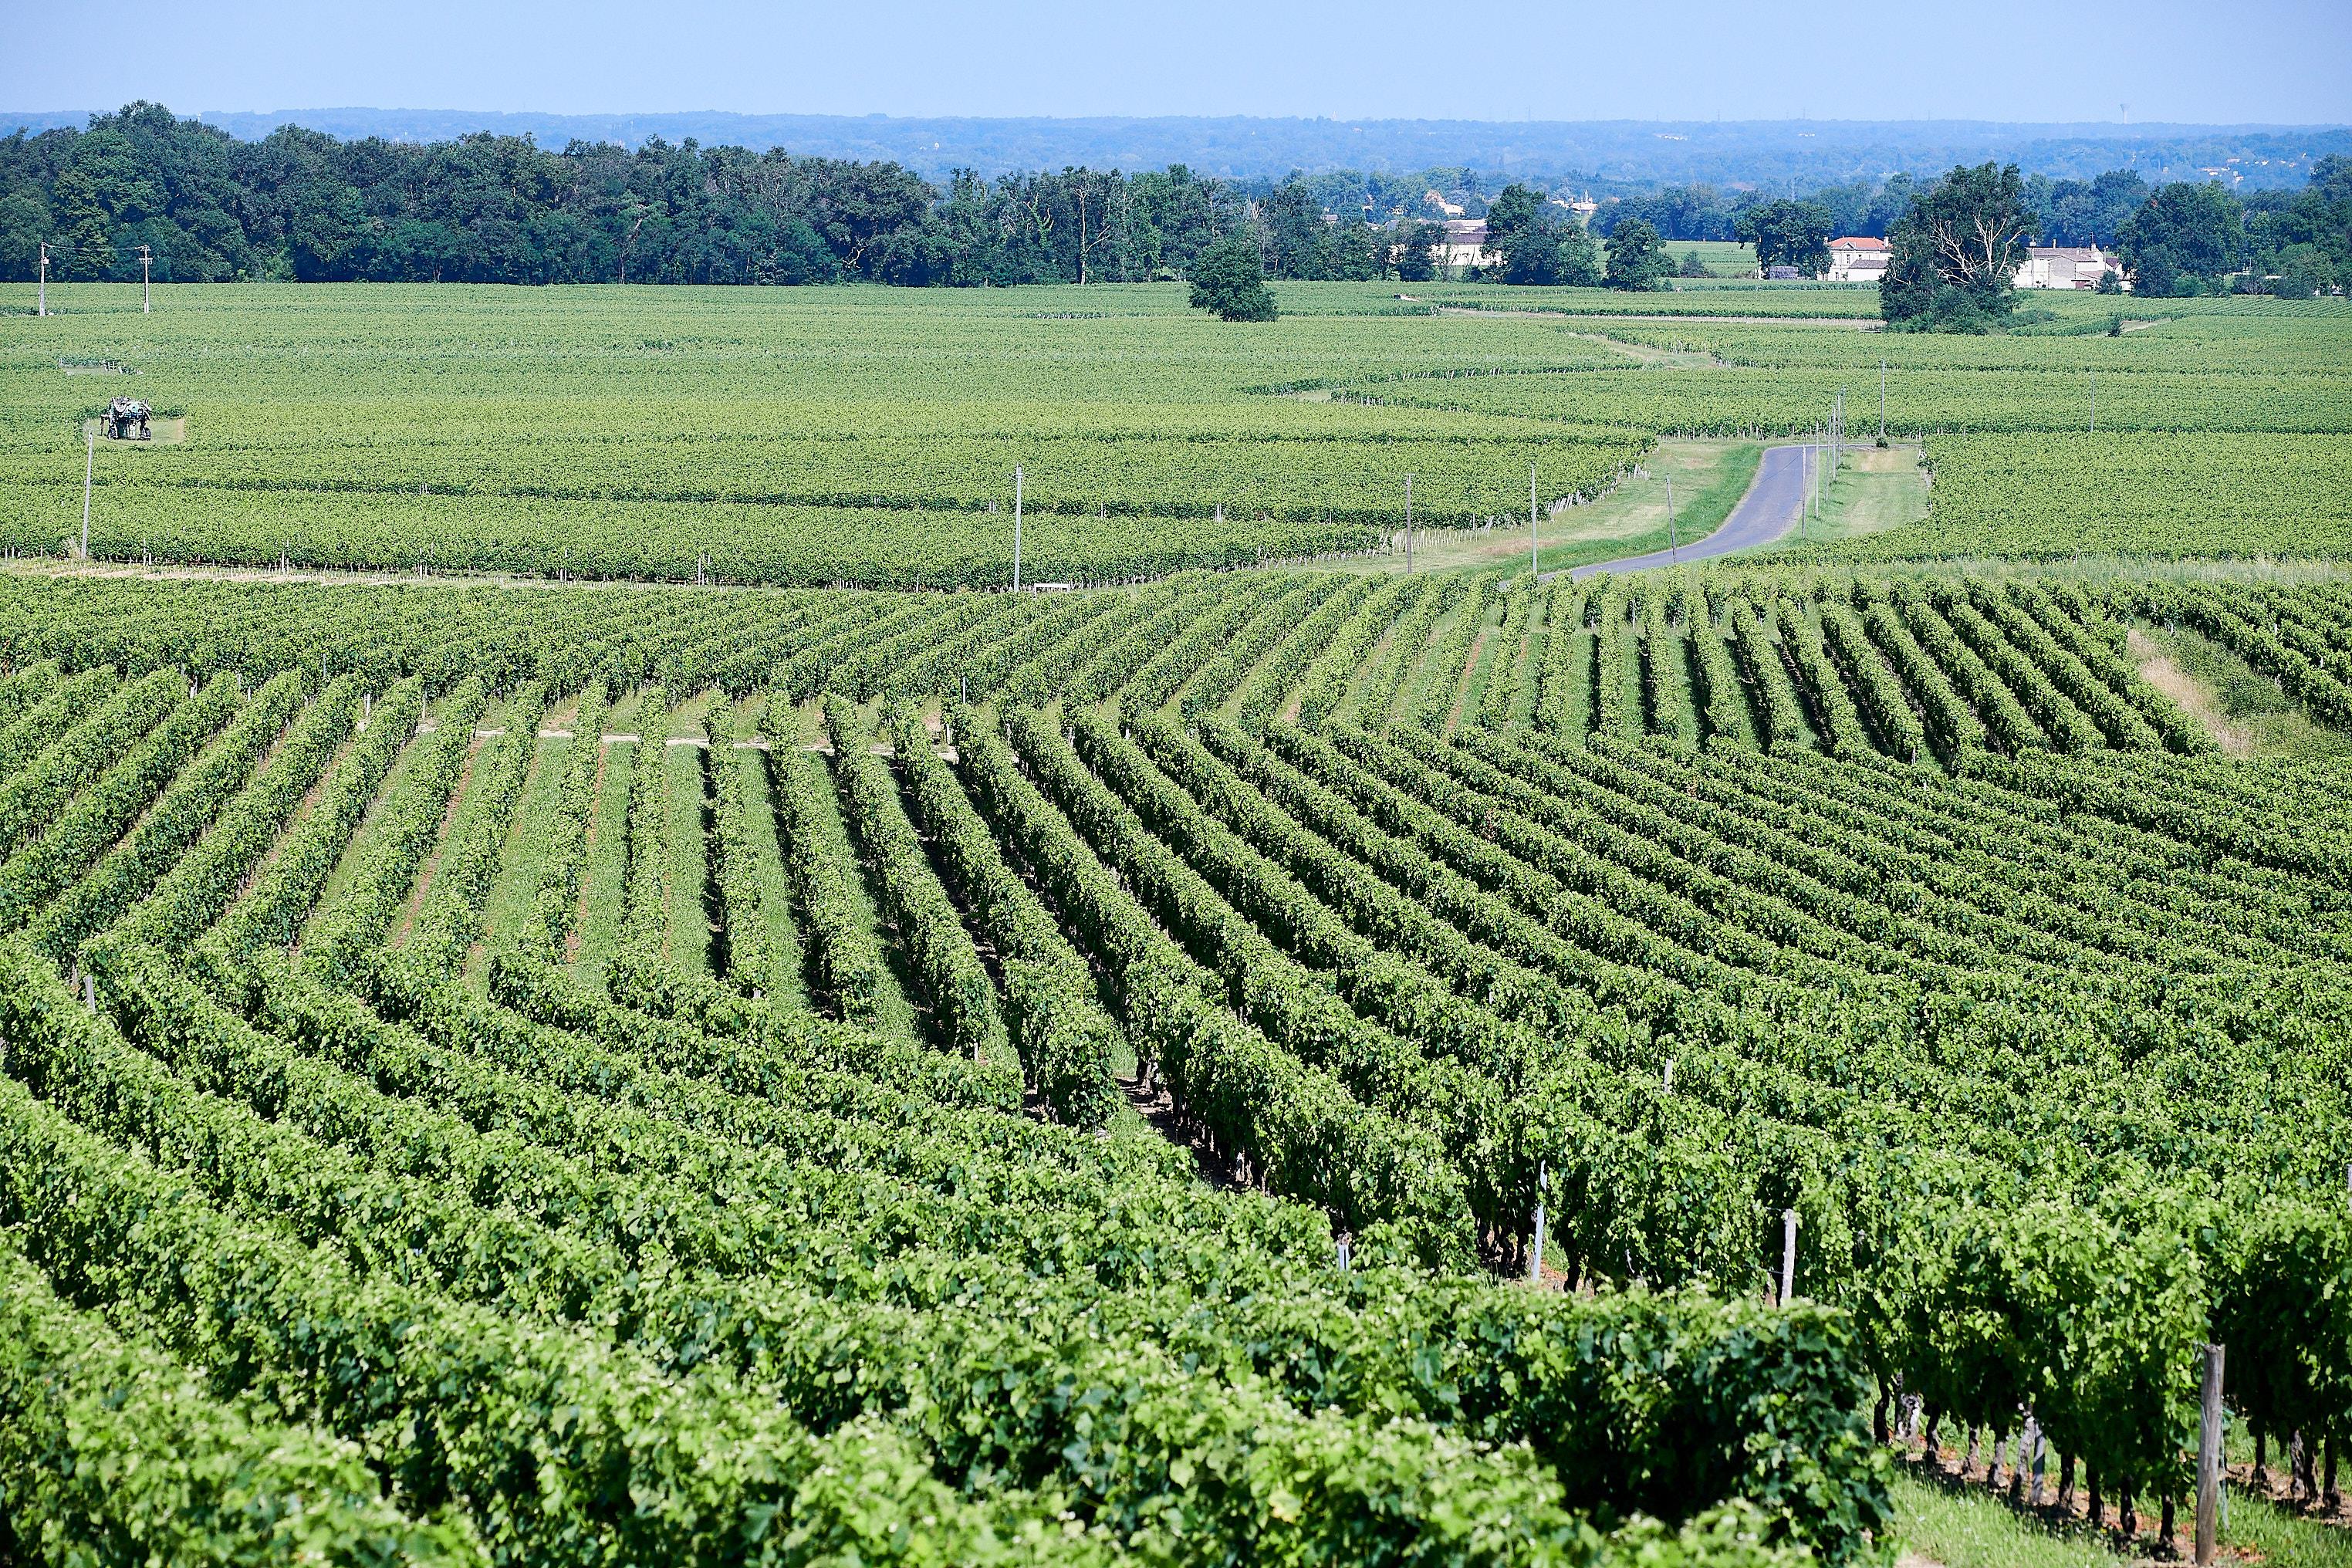 The vineyard Vignobles Bertin